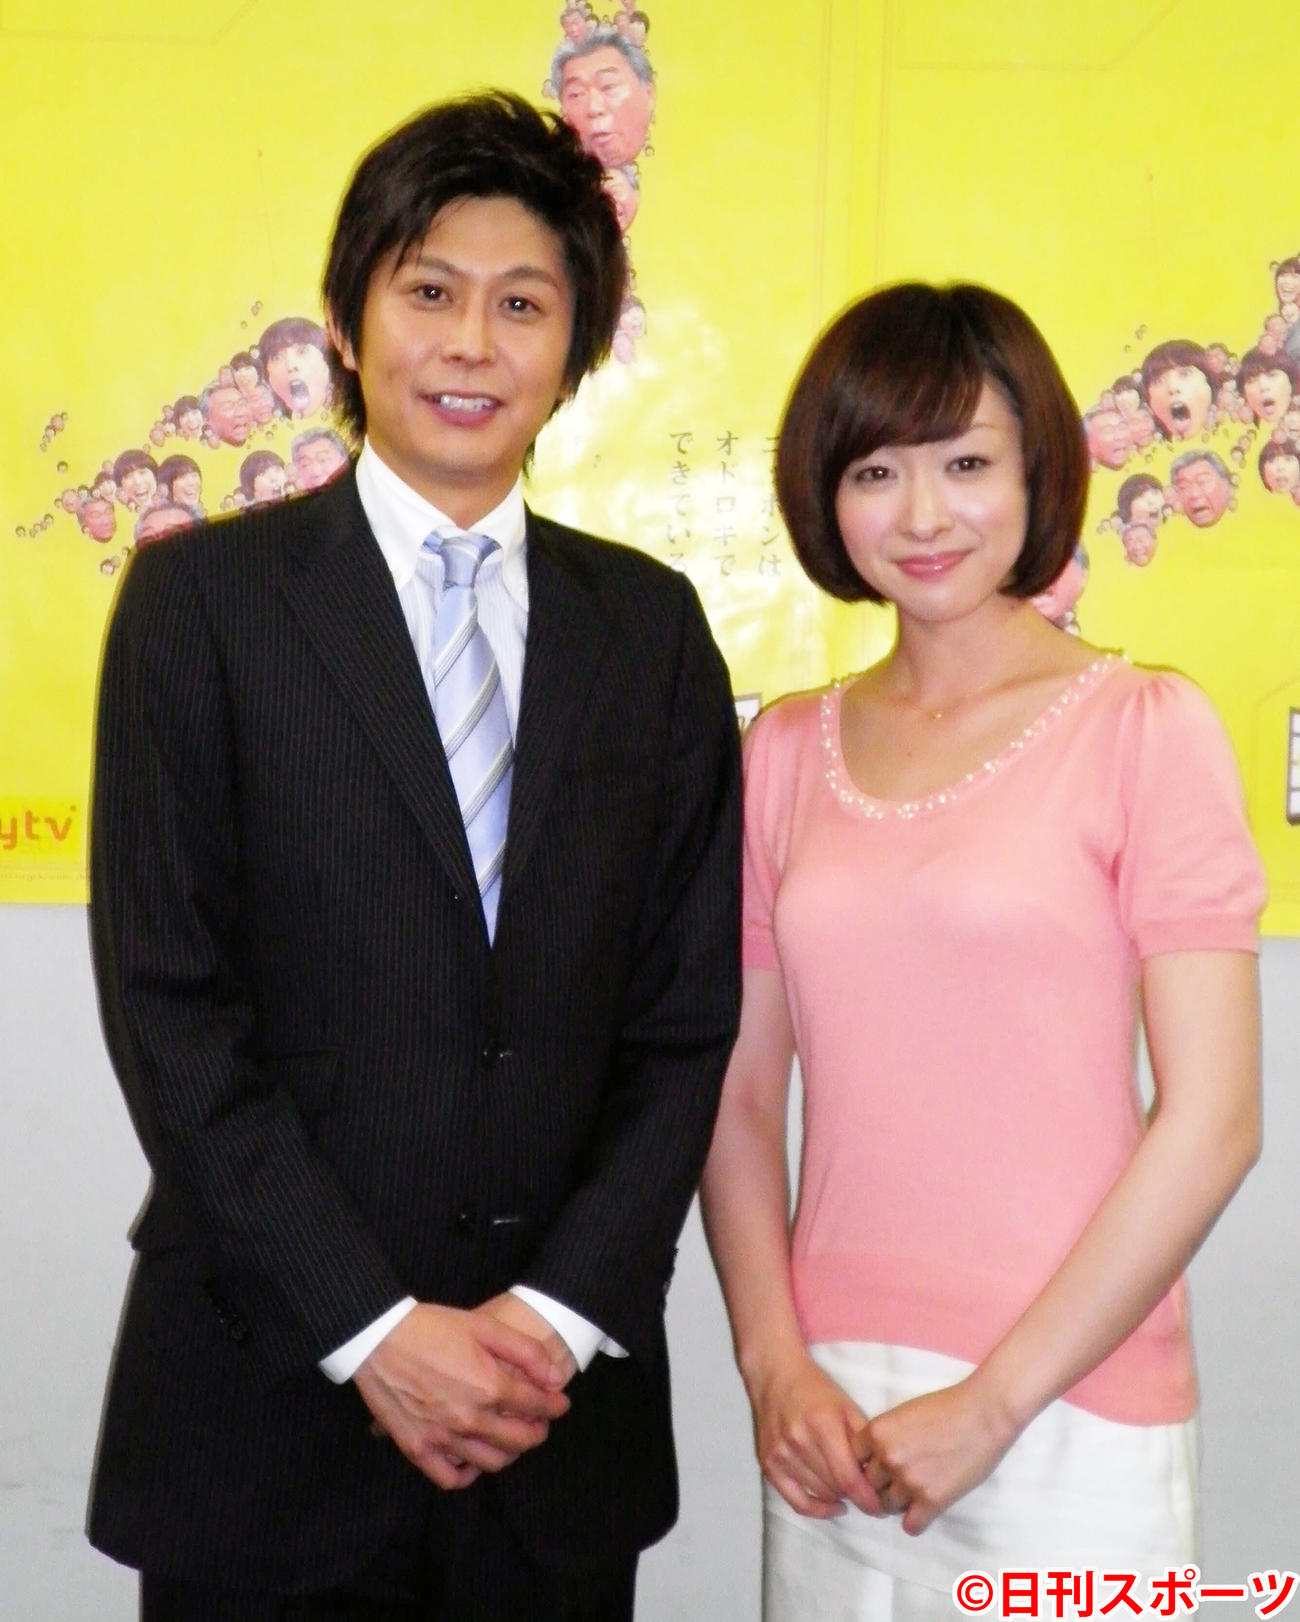 水沢駿(左)と黛英里佳(2011年6月6日撮影)